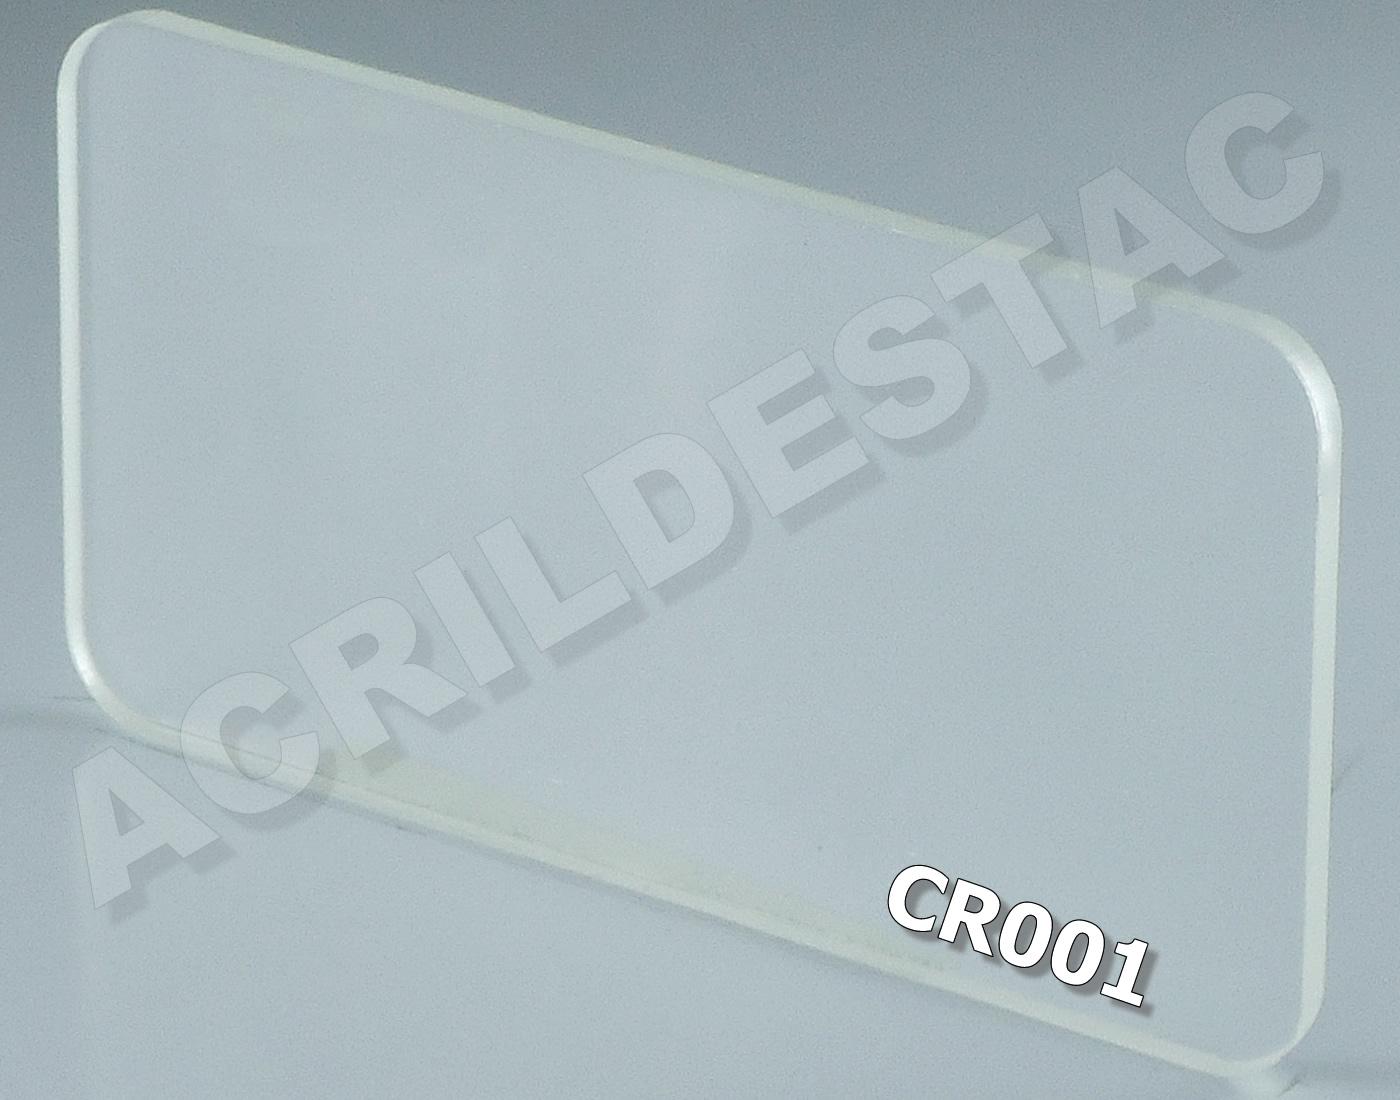 1 x 1 metro - 2mm - CRISTAL Transparente PL-CR001 -